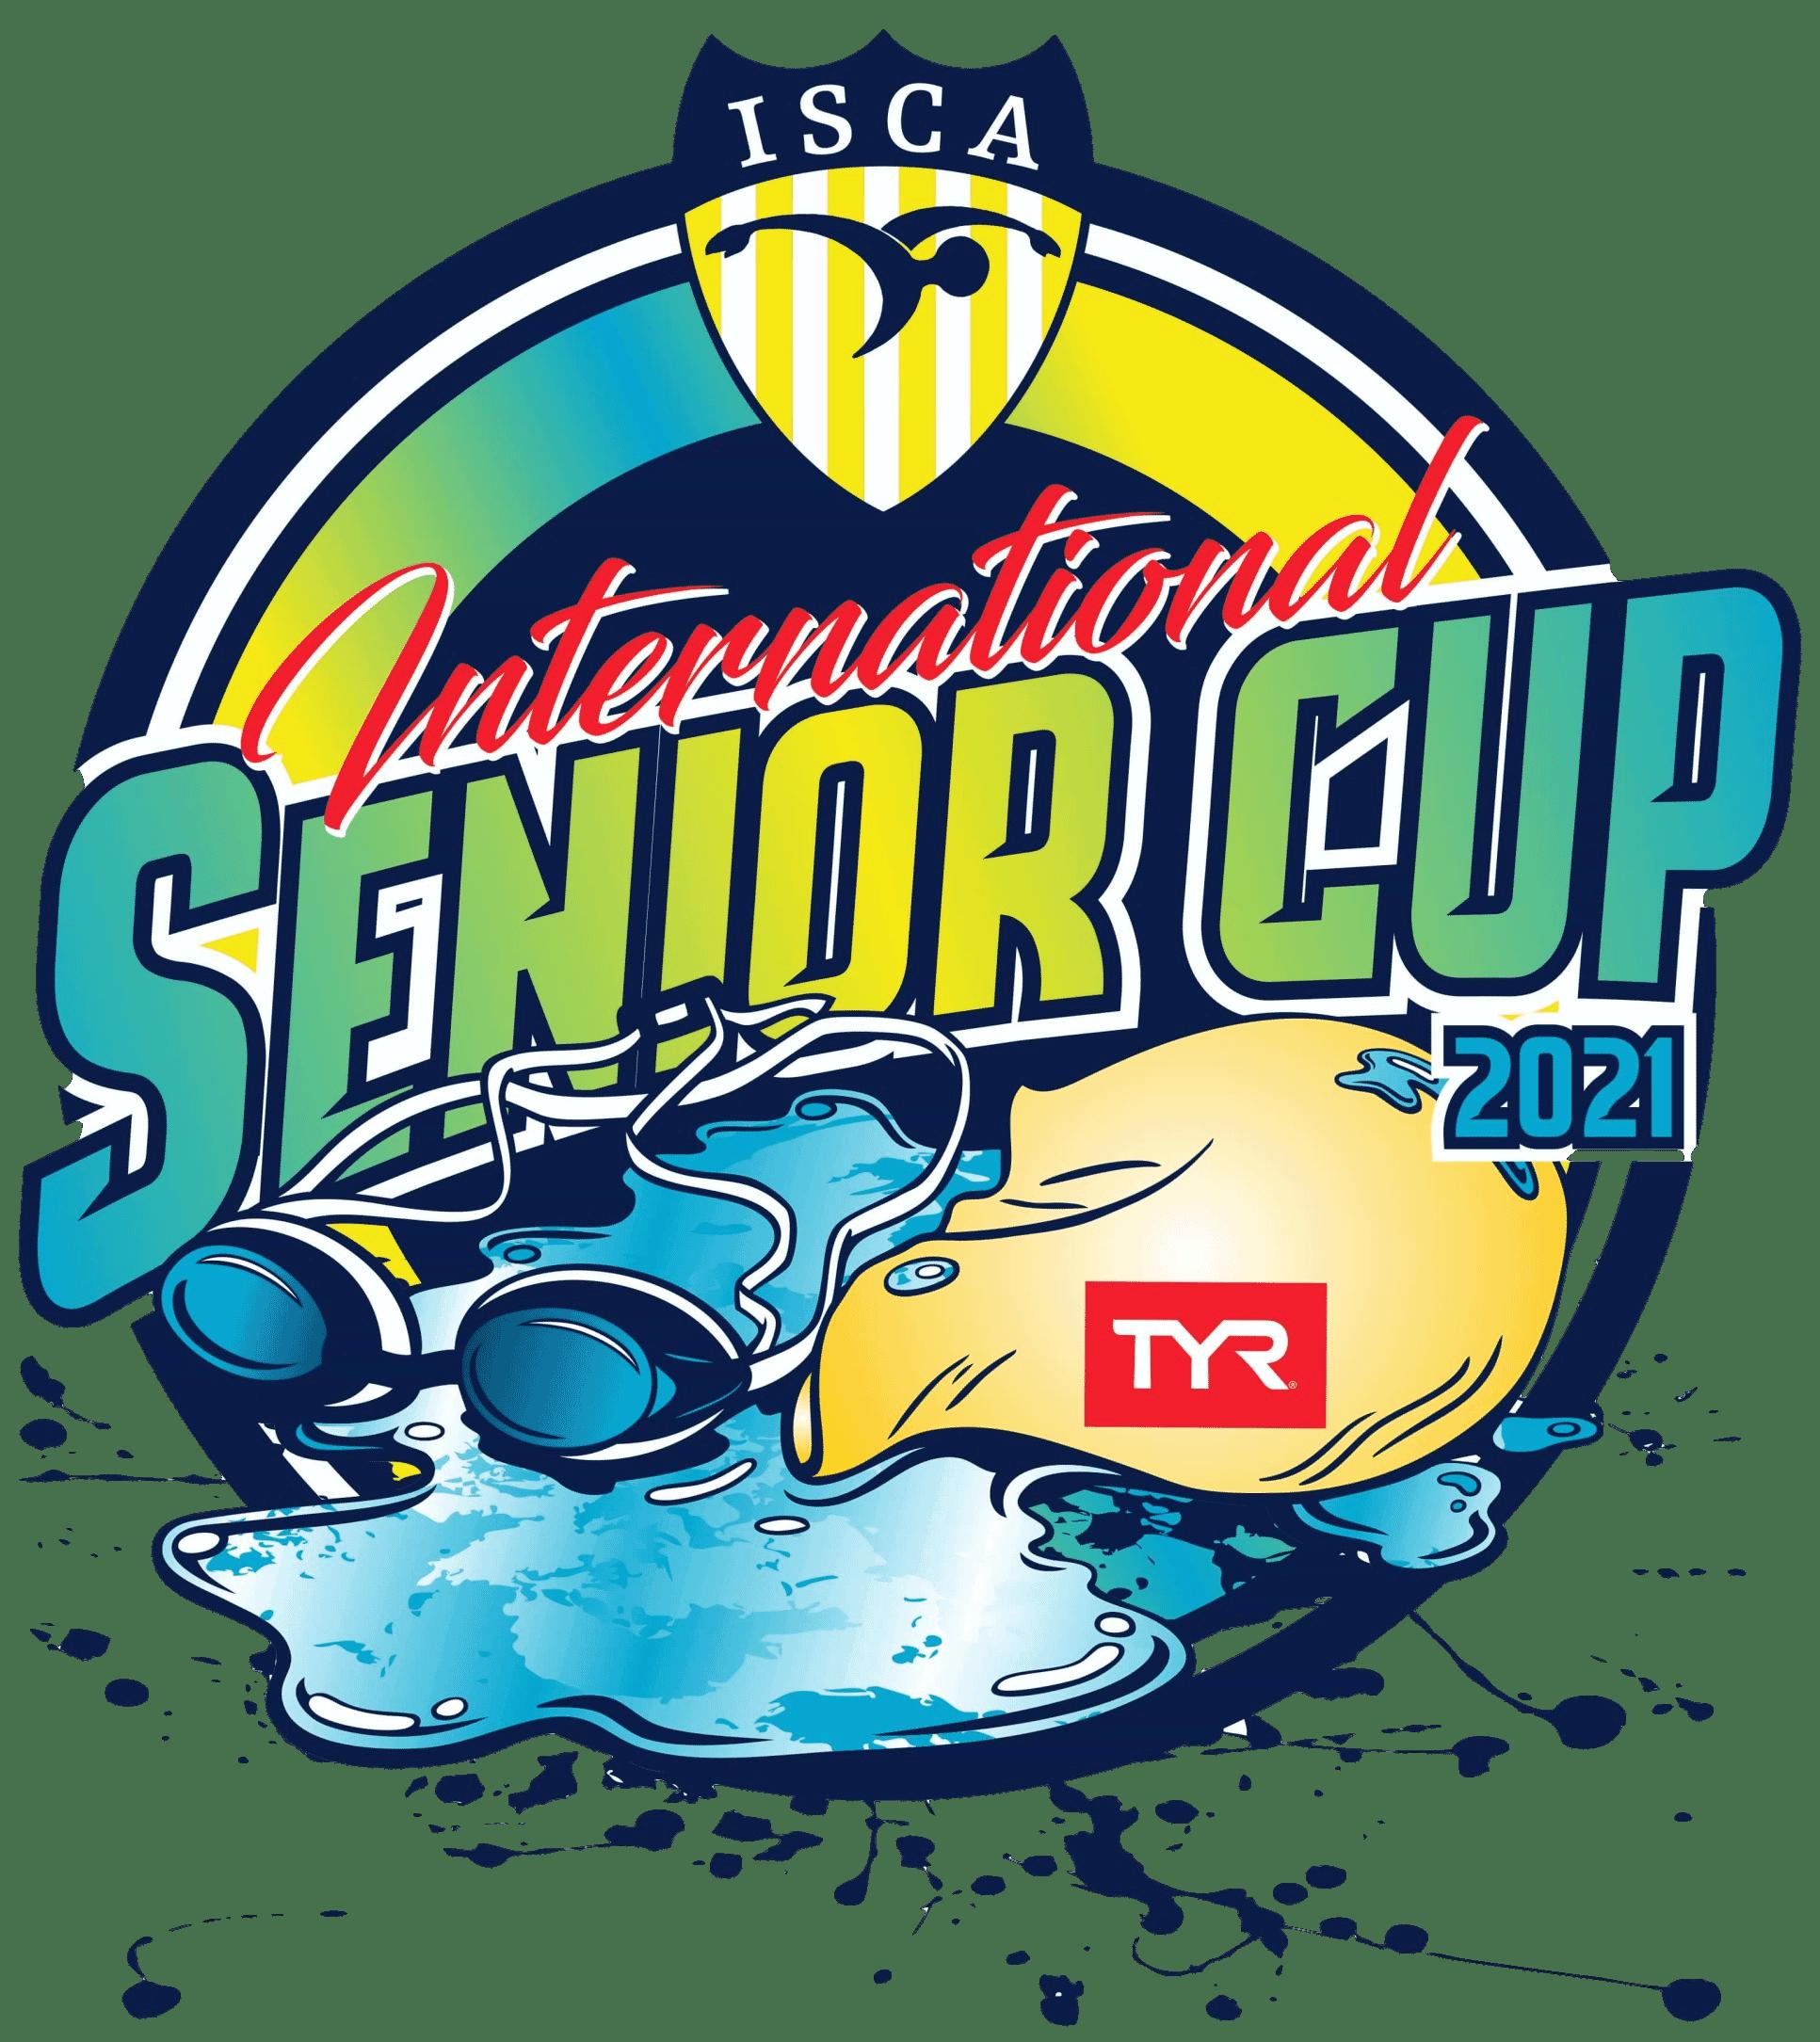 ISCA International Senior Cup 2021 logo clipped